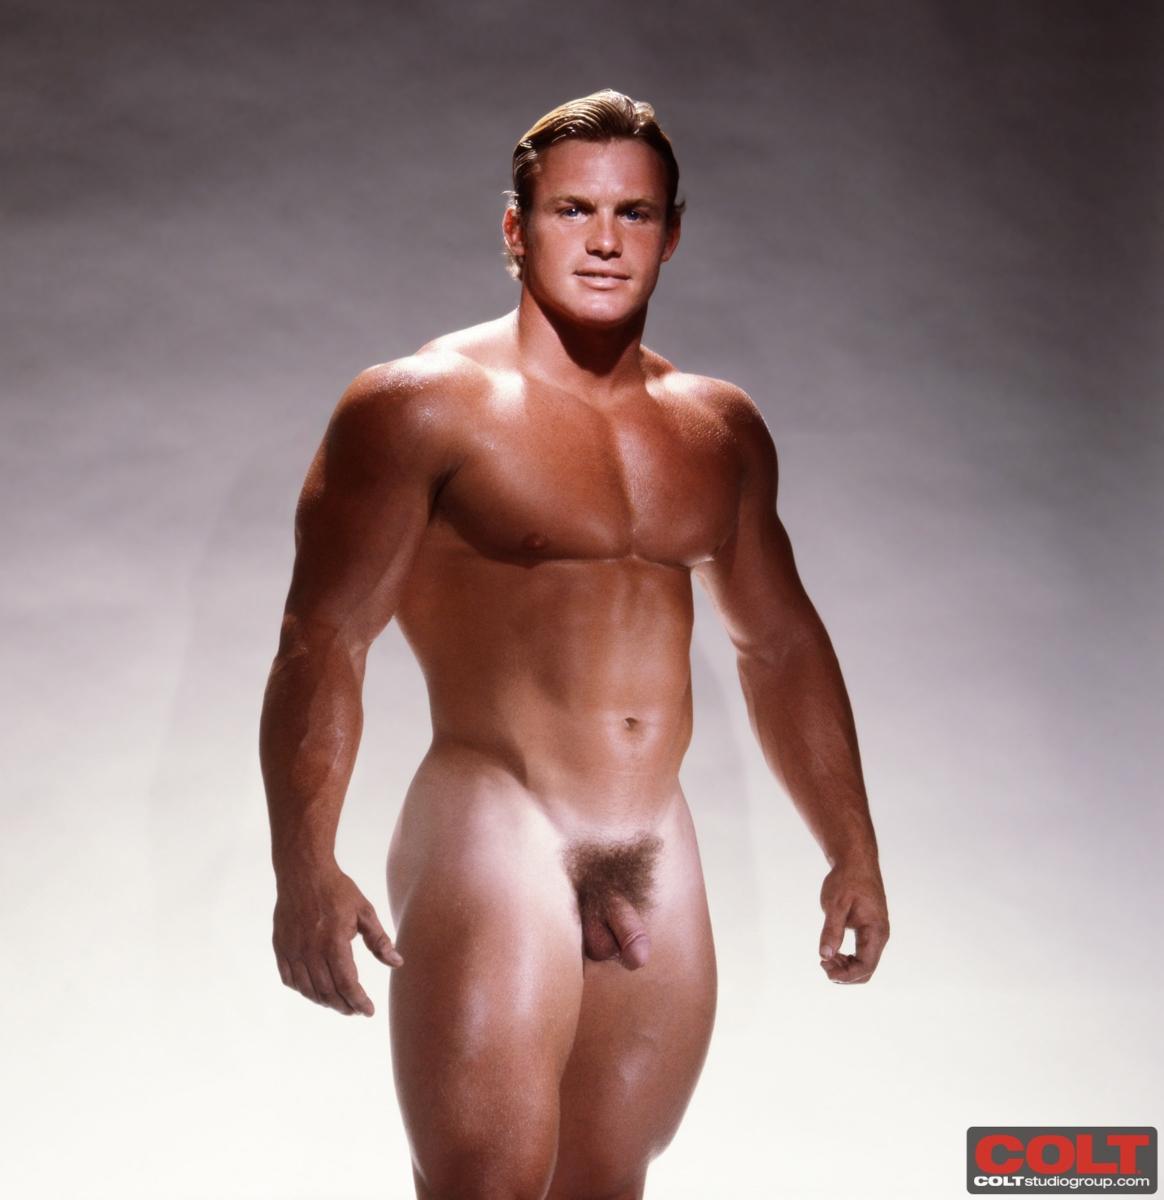 Teen california blond boys naked hot nude